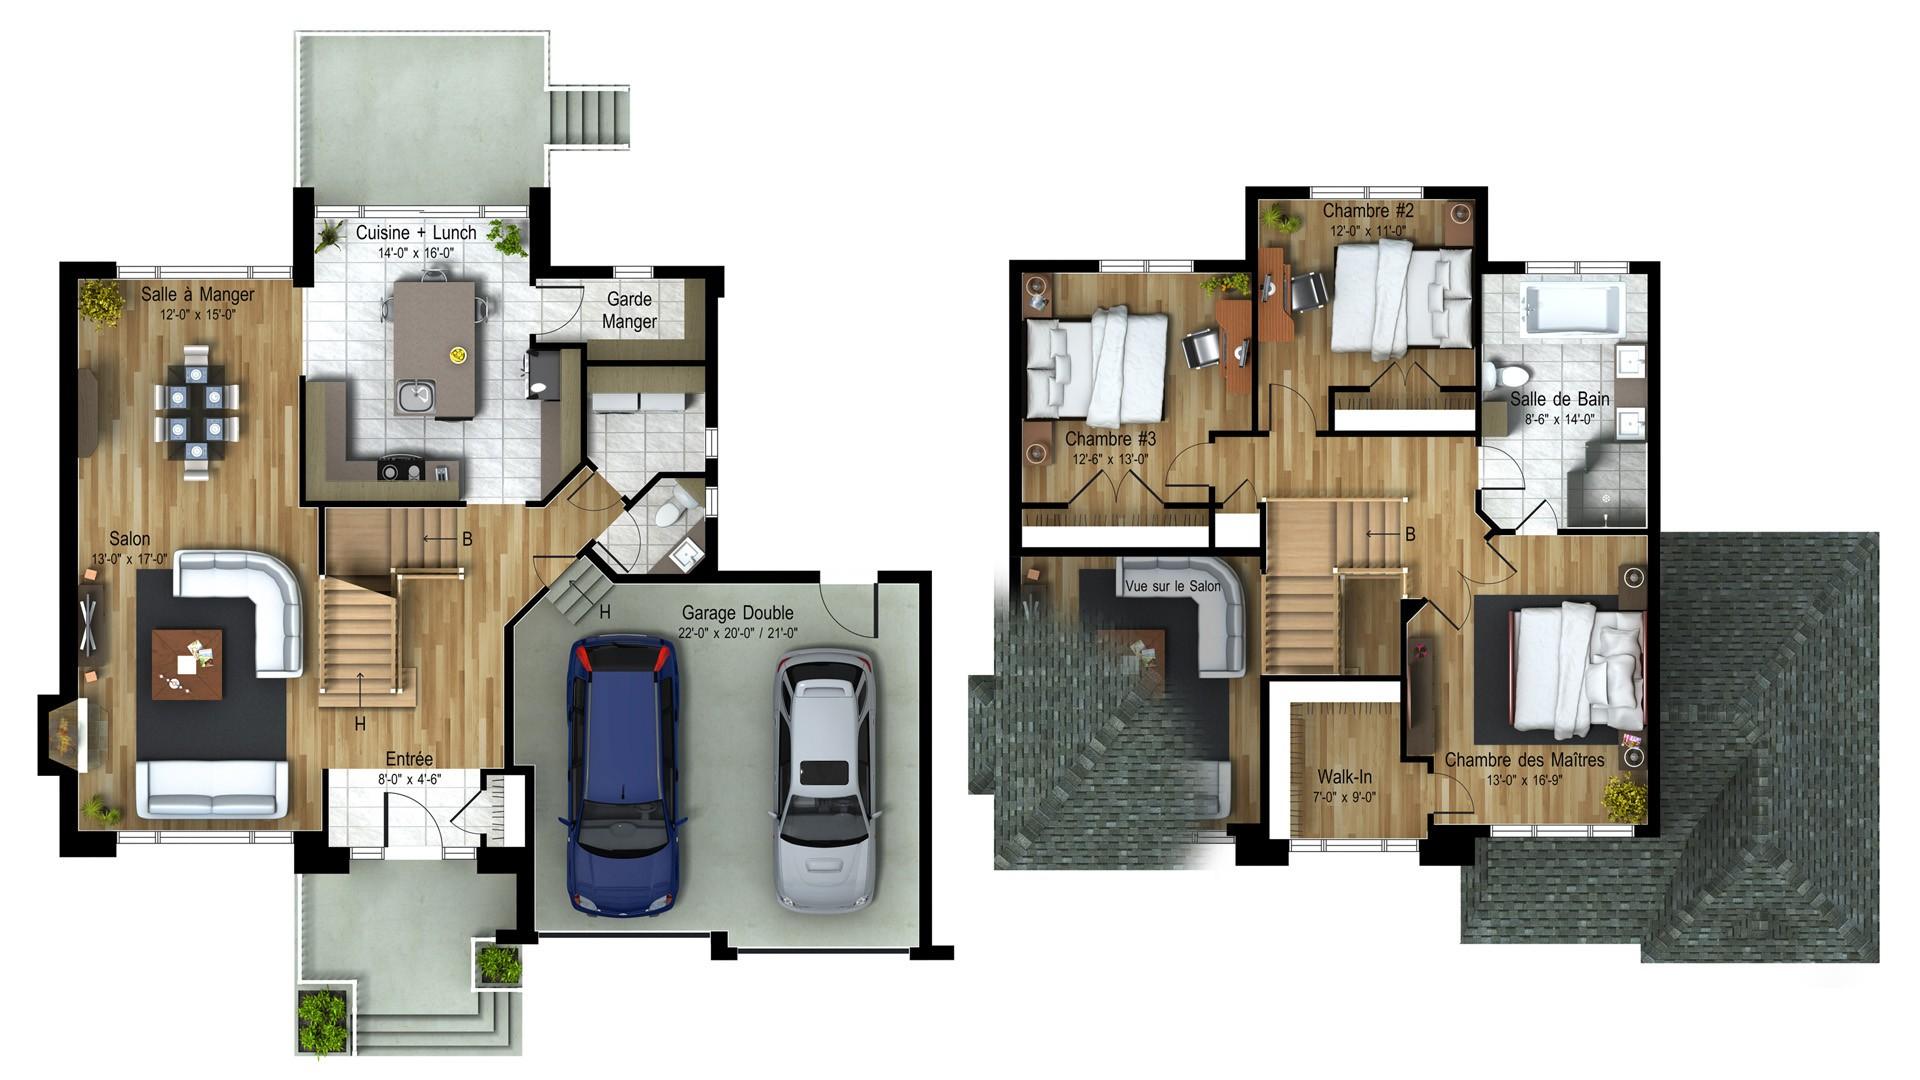 Cottage_Contemporain_Nuevo_Plan maison de prestige_Domicil